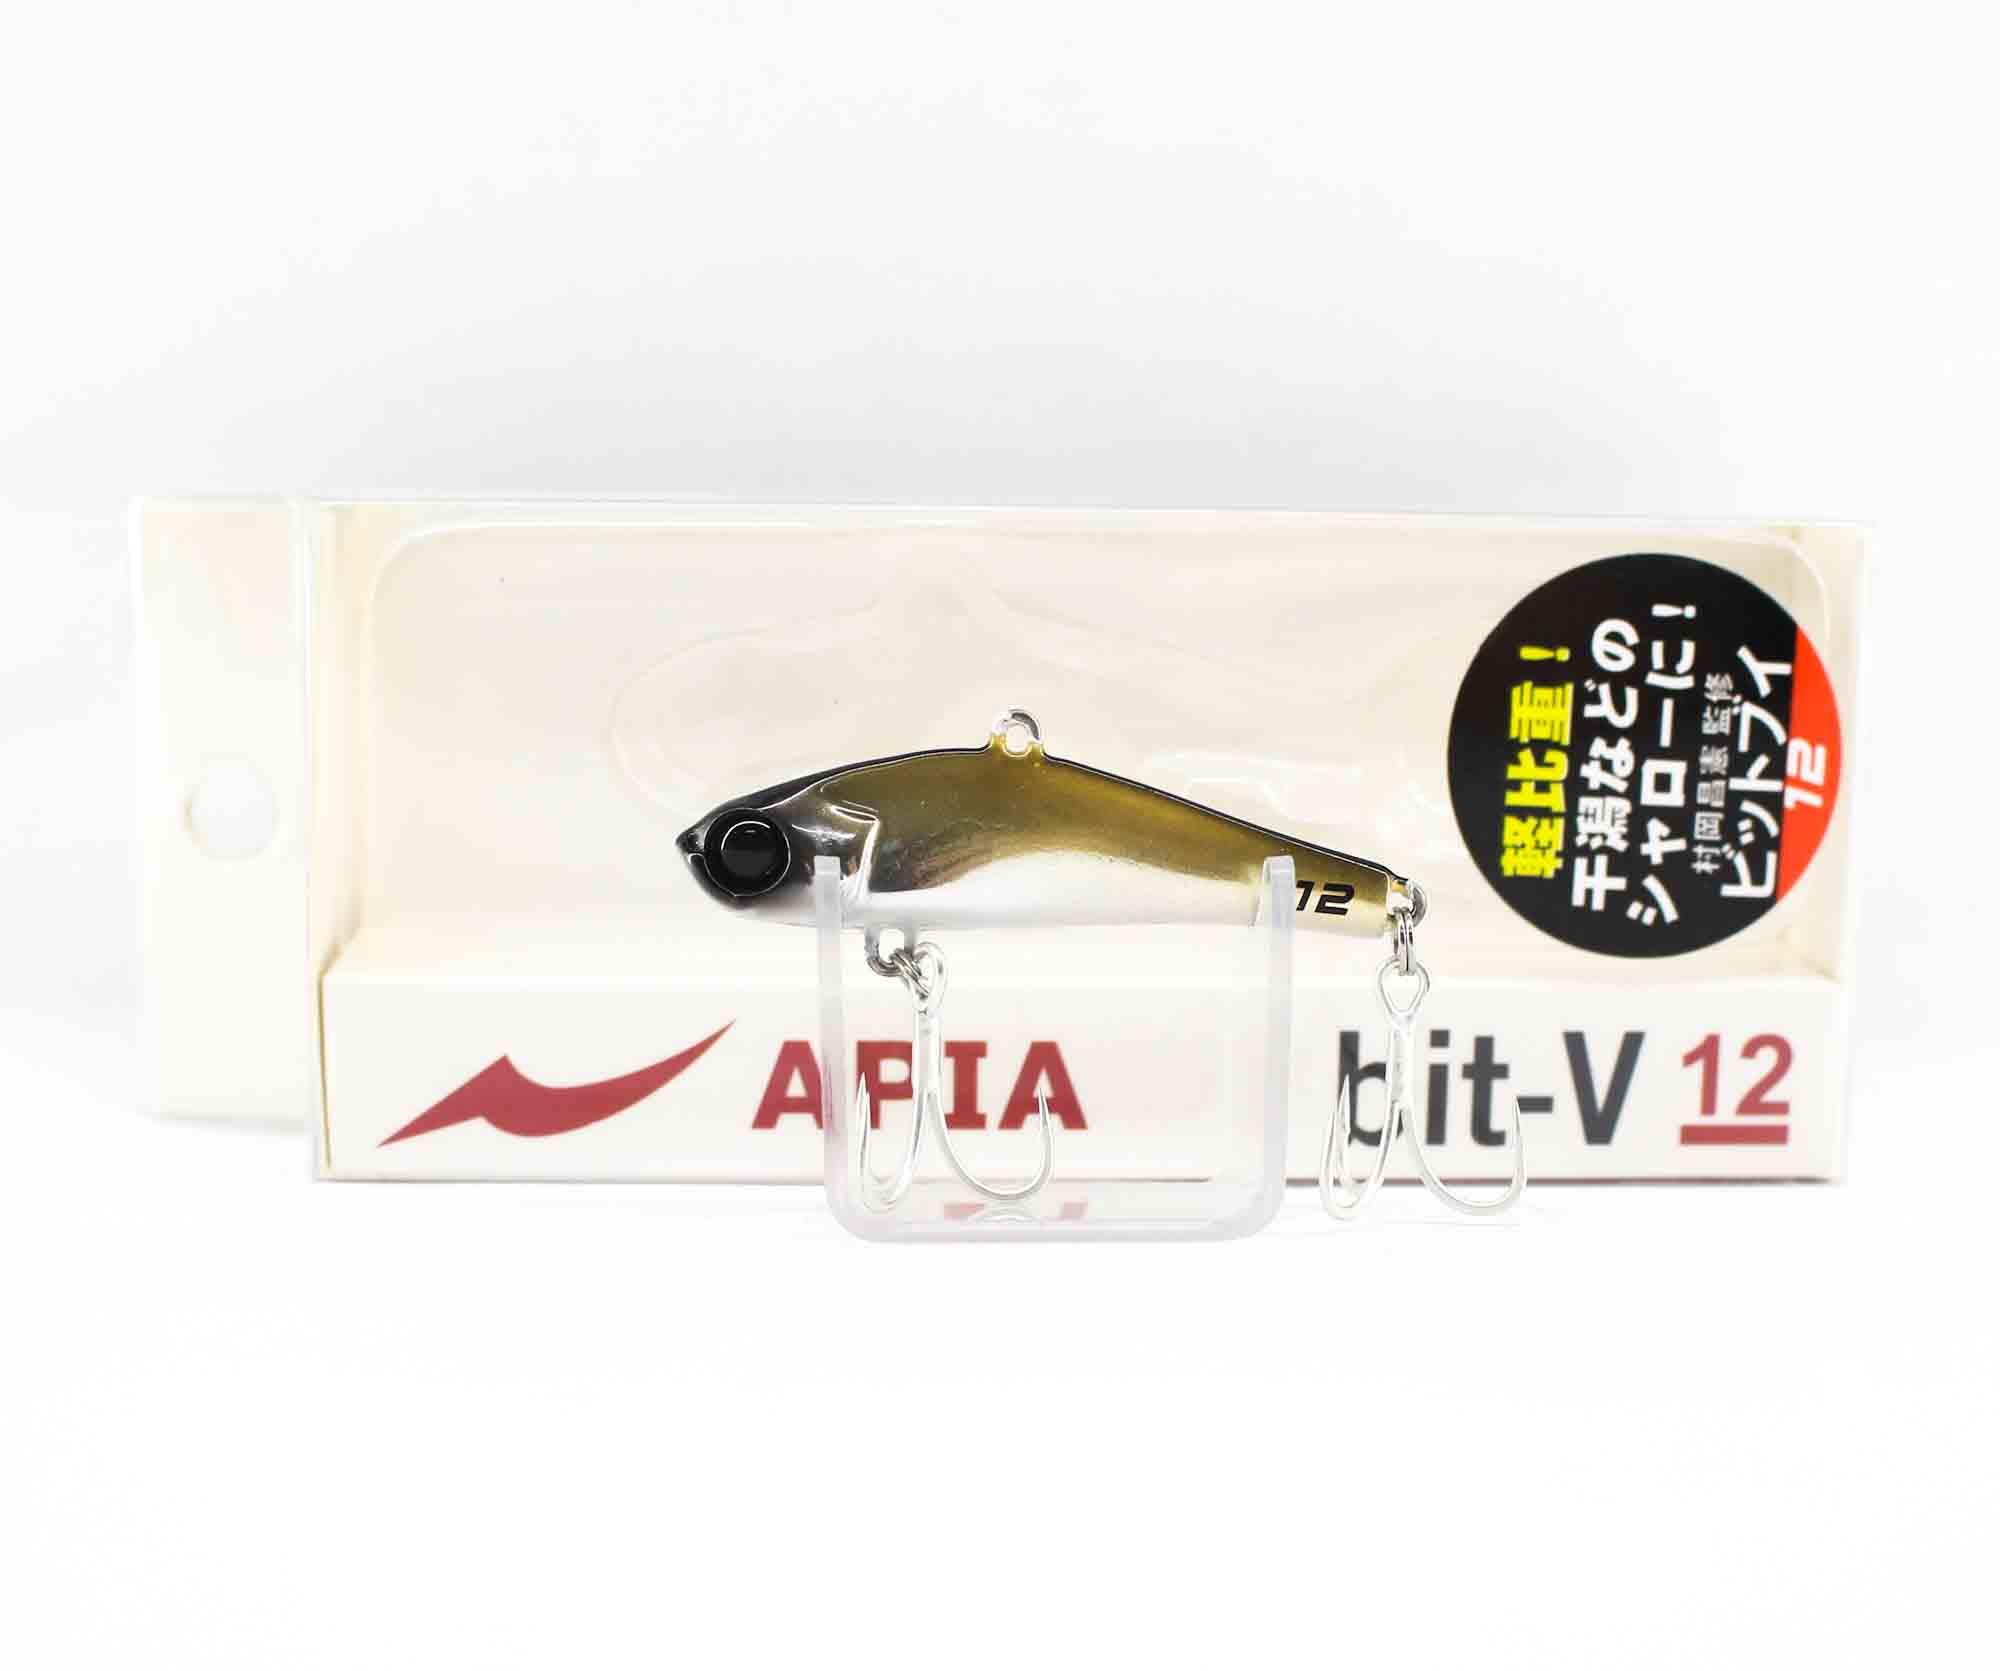 Apia Bit-V Metal Vibration 12 grams Sinking Lure 004 (5275)